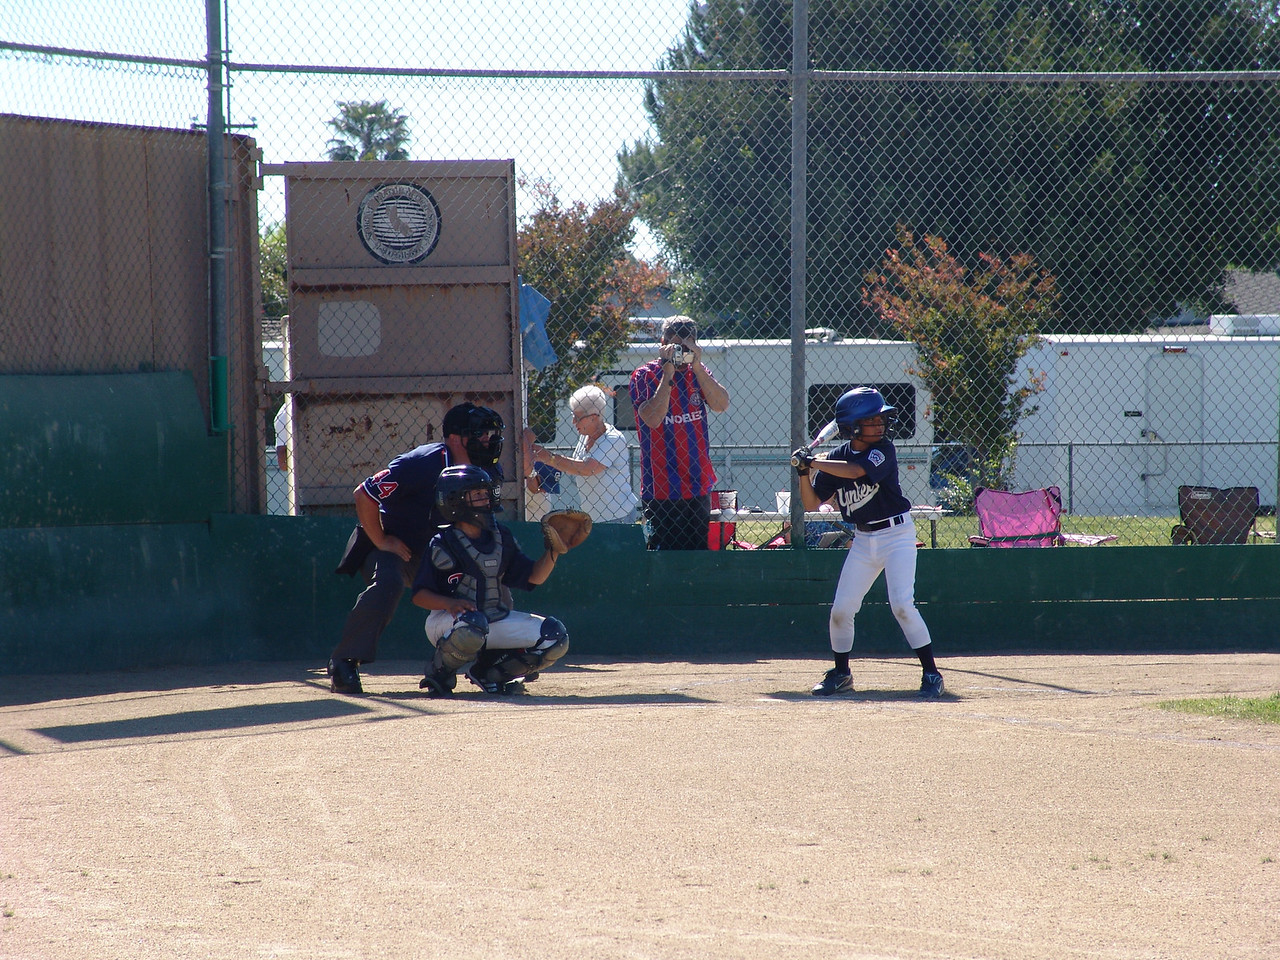 Yankees vs Twins TrnRnd2 (4)